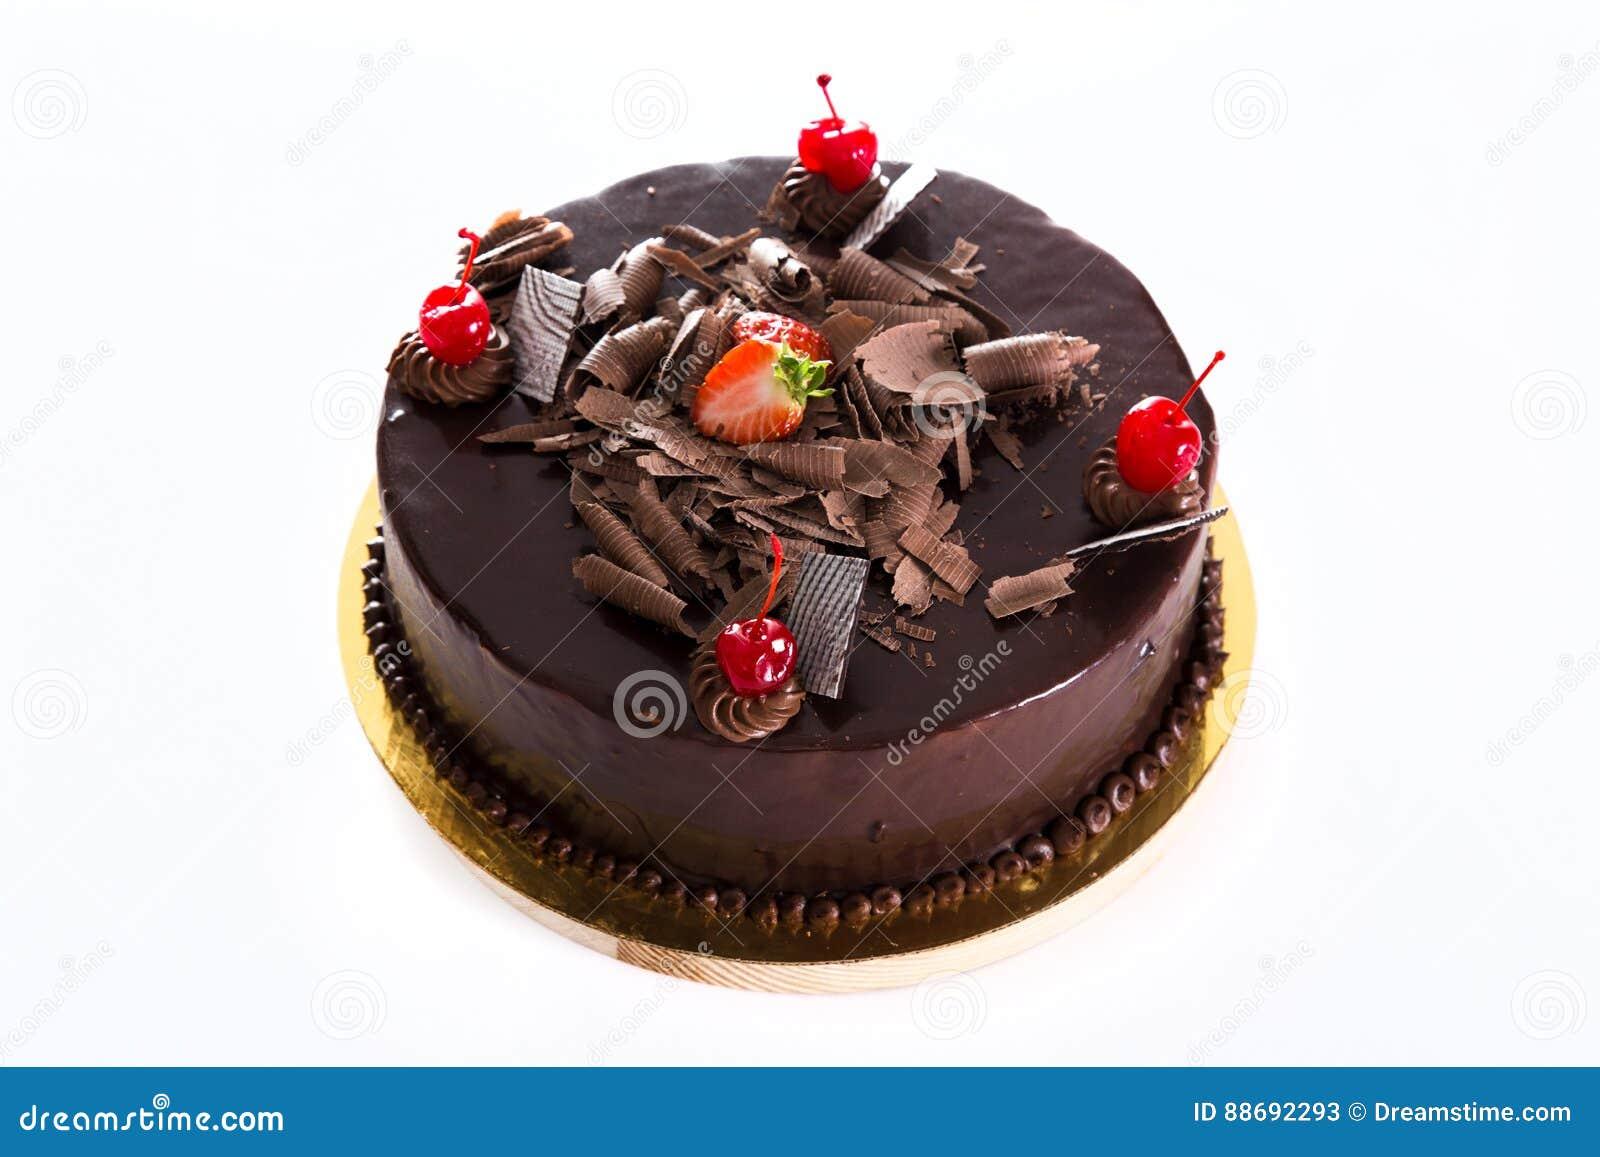 Cake Happy Birthday Stock Image Image Of Pecans Biscuit 88692293